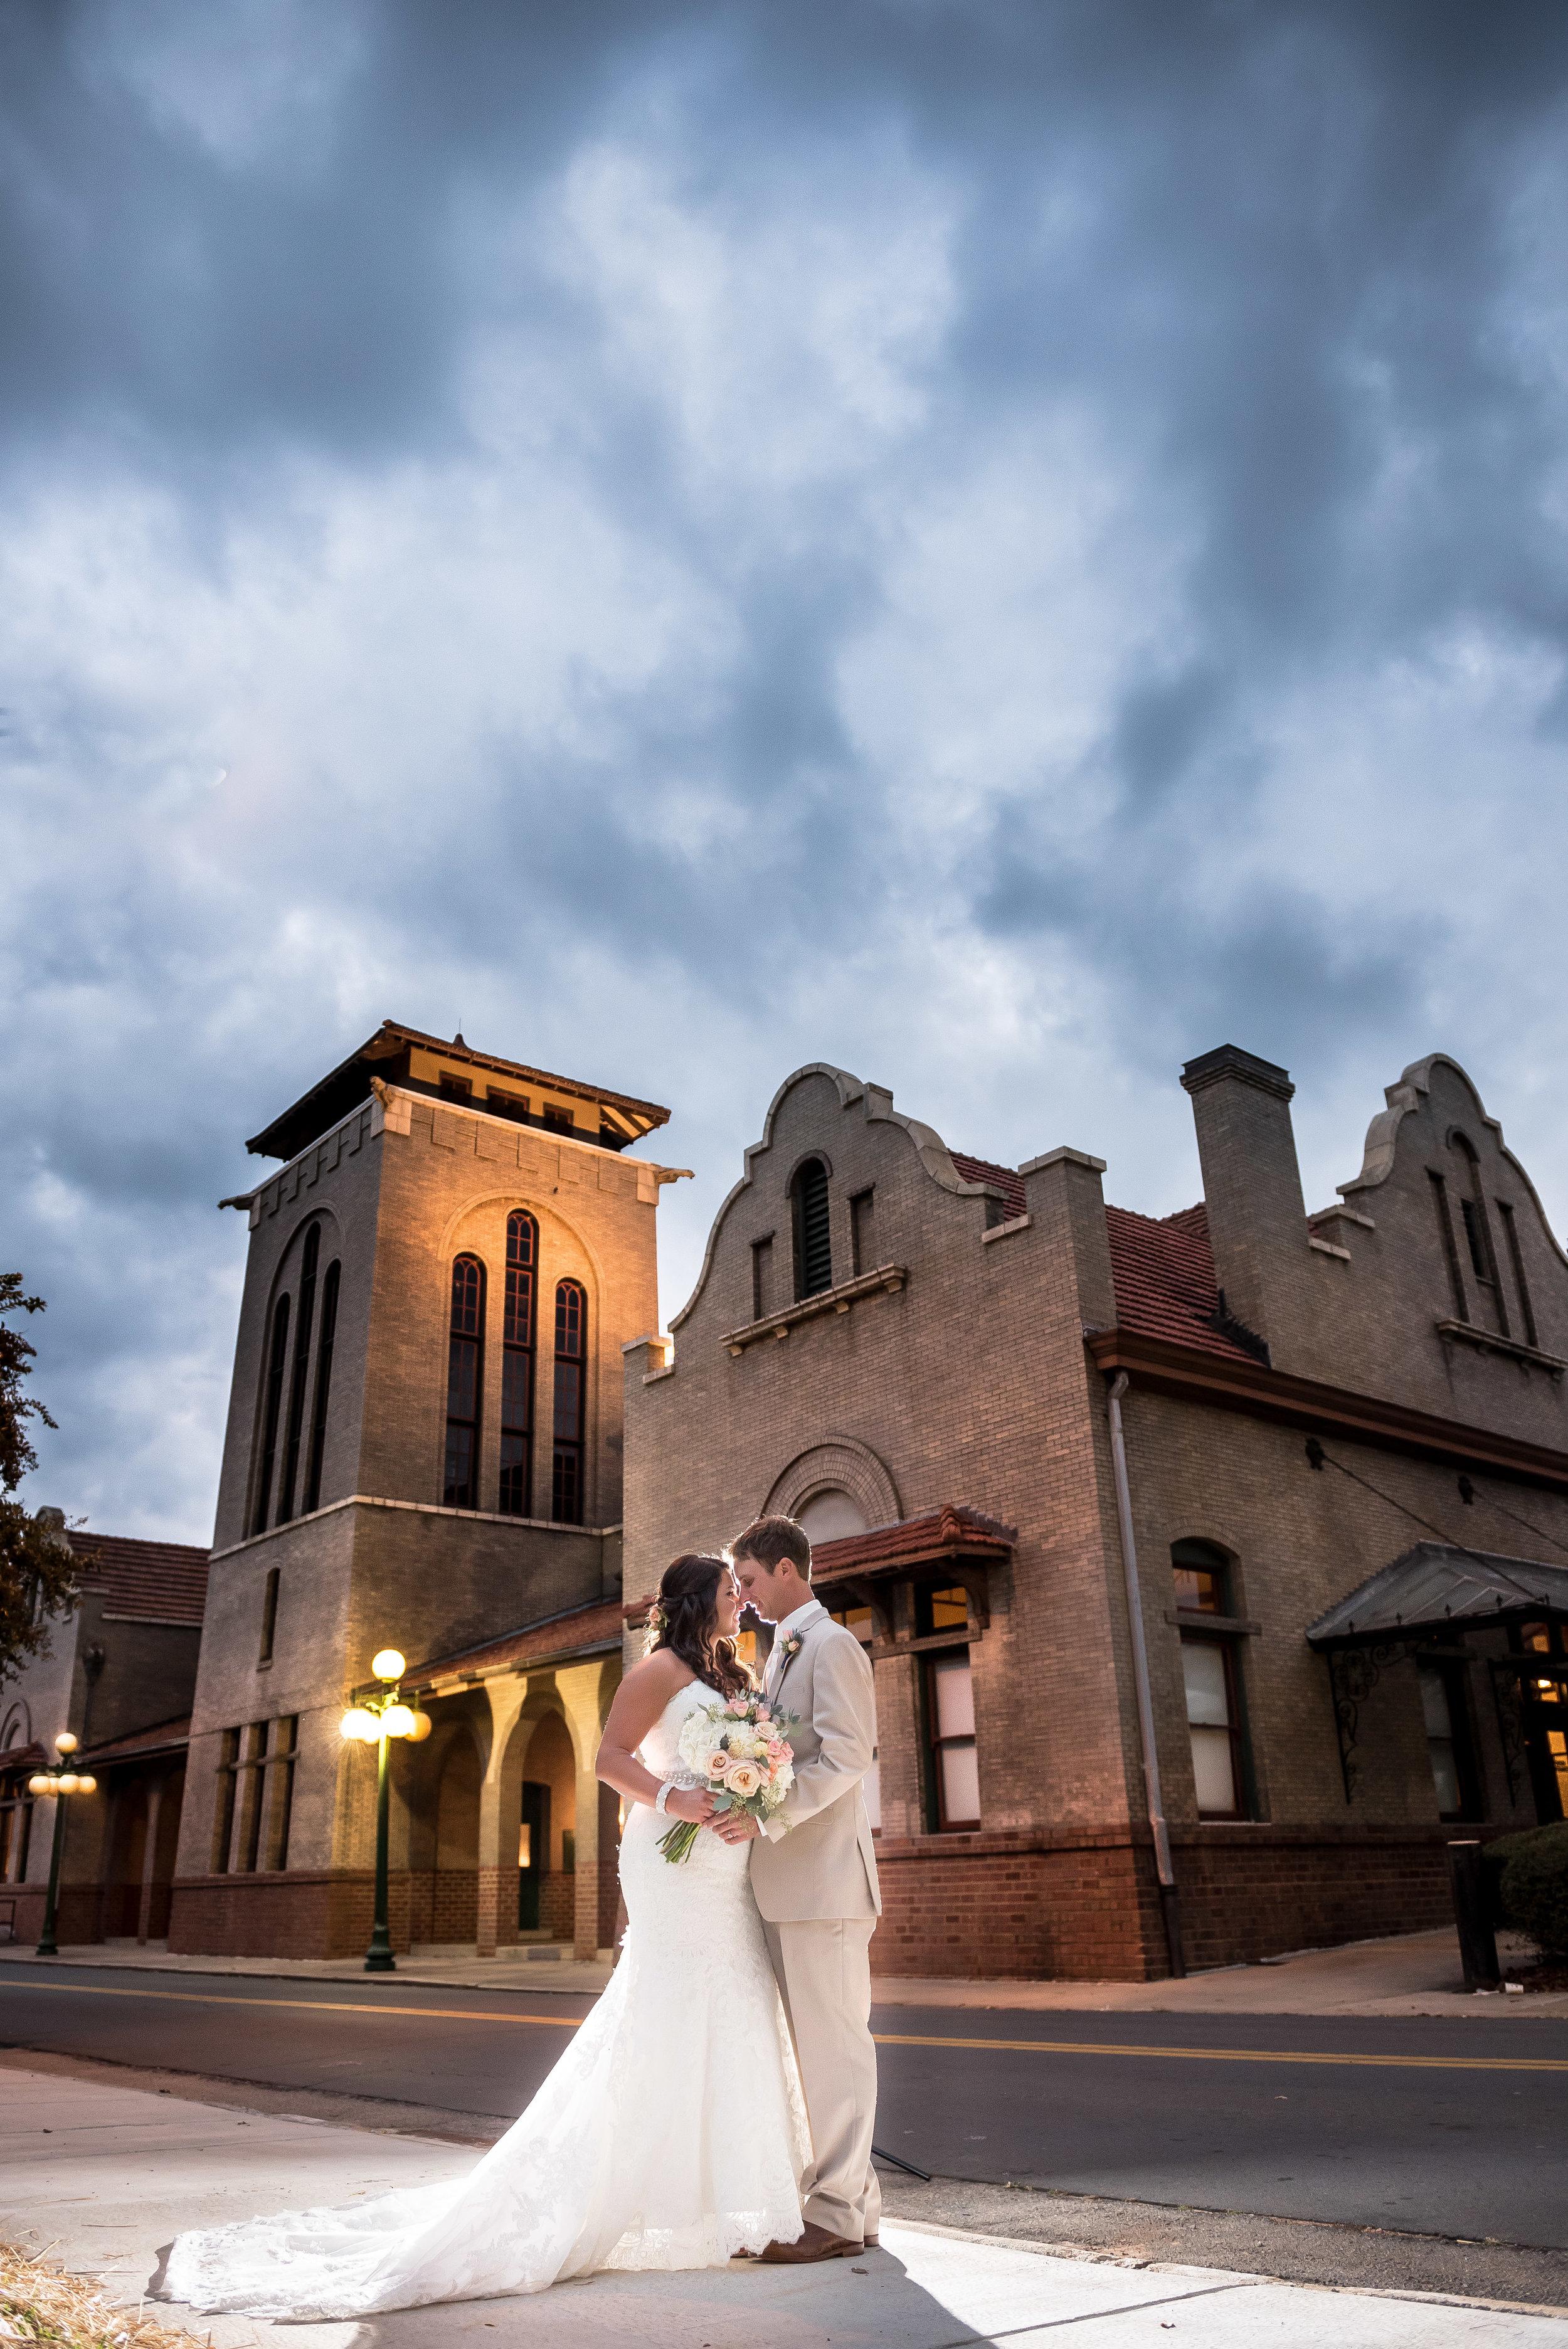 The Salisbury Train Depot | Salisbury NC | Best Wedding Venues in Piedmont Triad NC